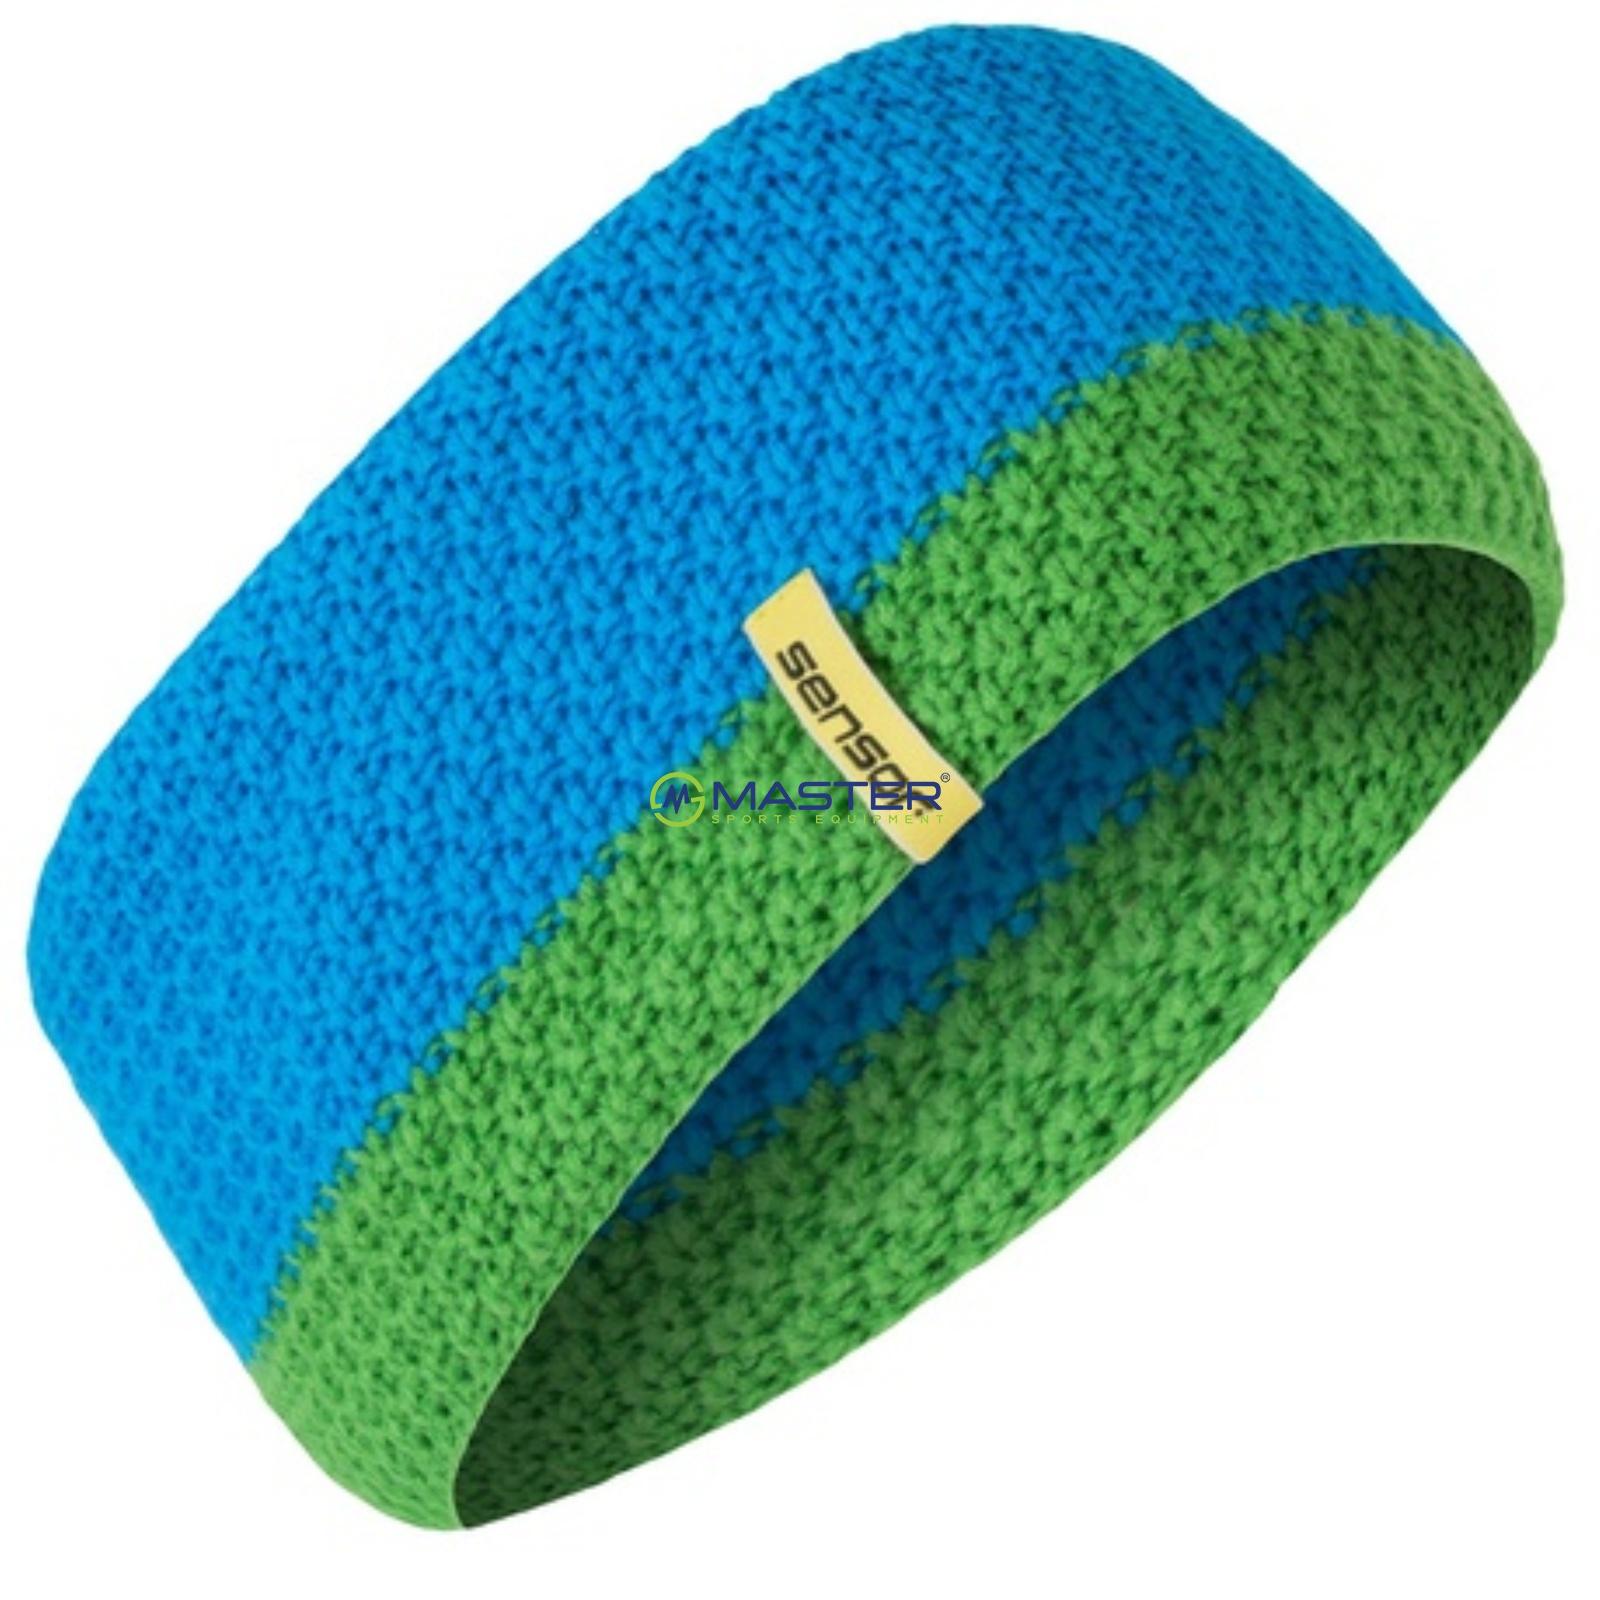 616d20aabae Čelenka SENSOR pletená modrá